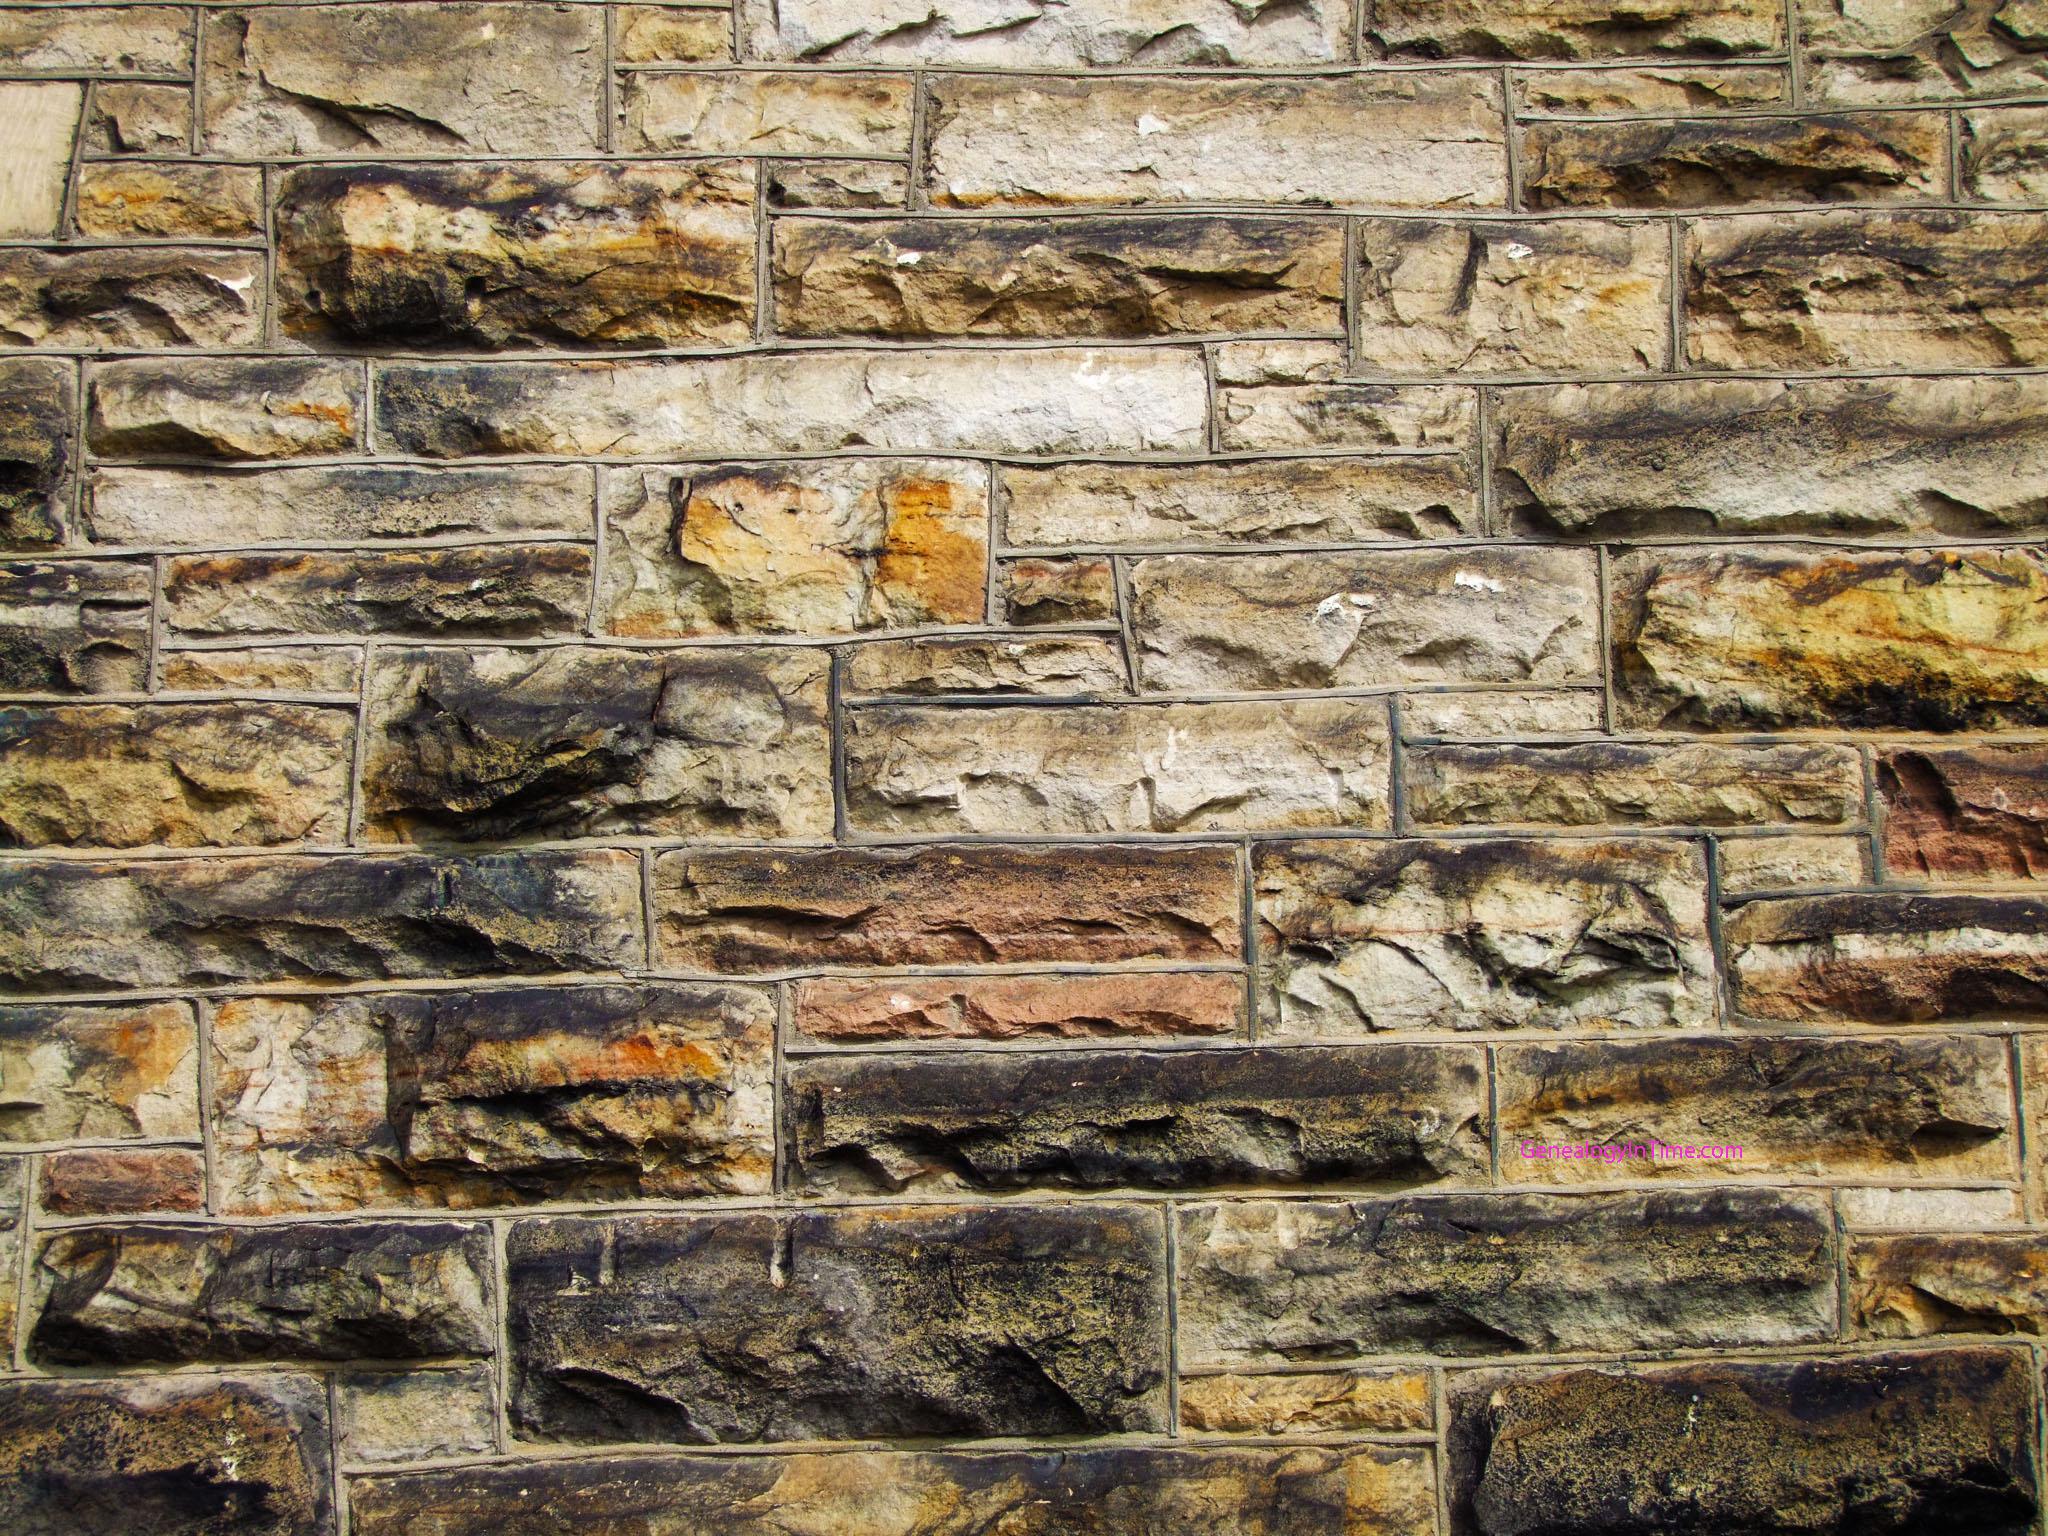 Brick Wall Images   Series 2 2048x1536